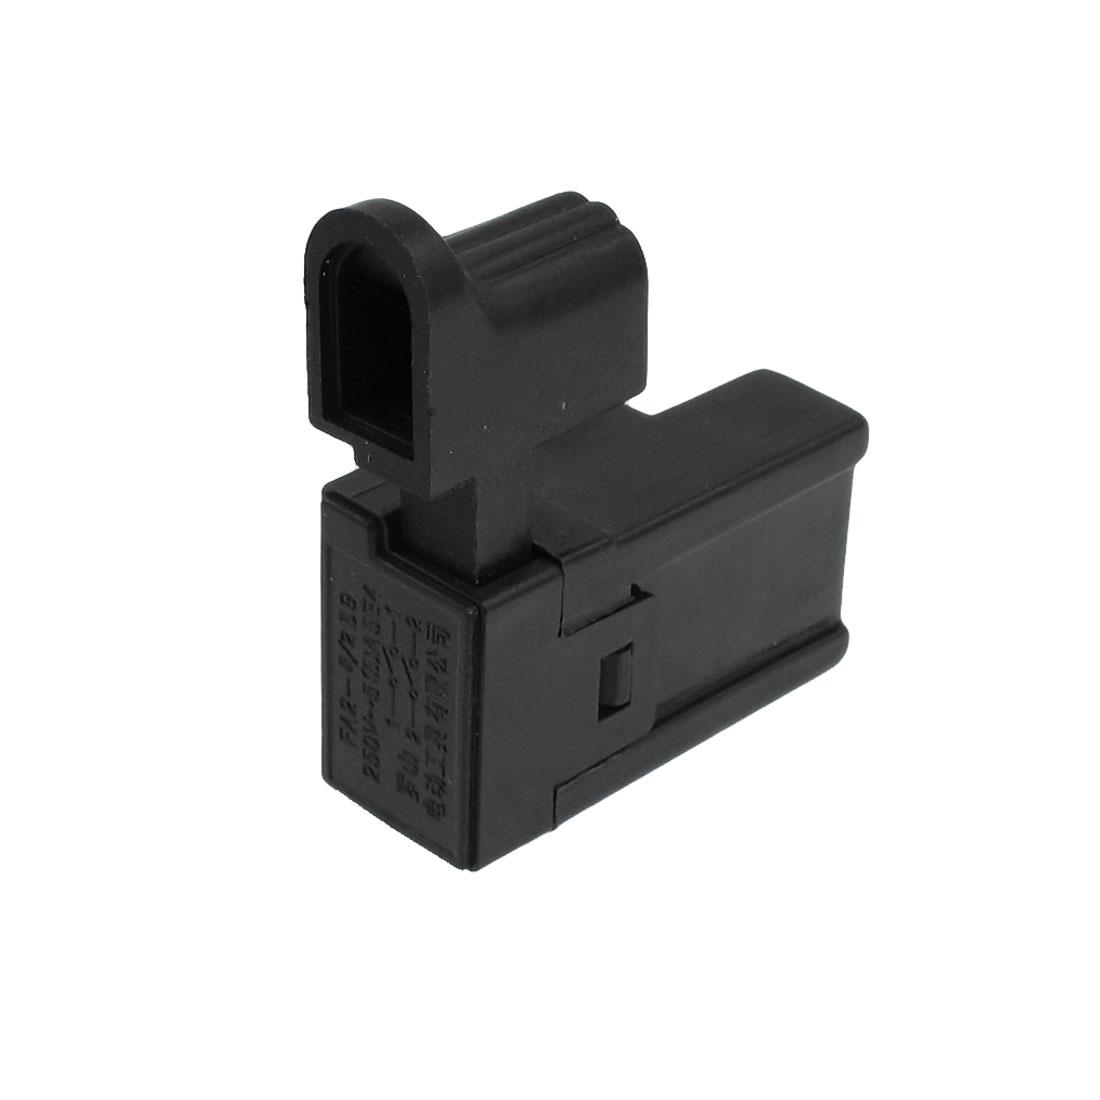 5A 250V AC 5E4 DPST Momentary Cordless Drill Switch Black FA2-5/2 B9